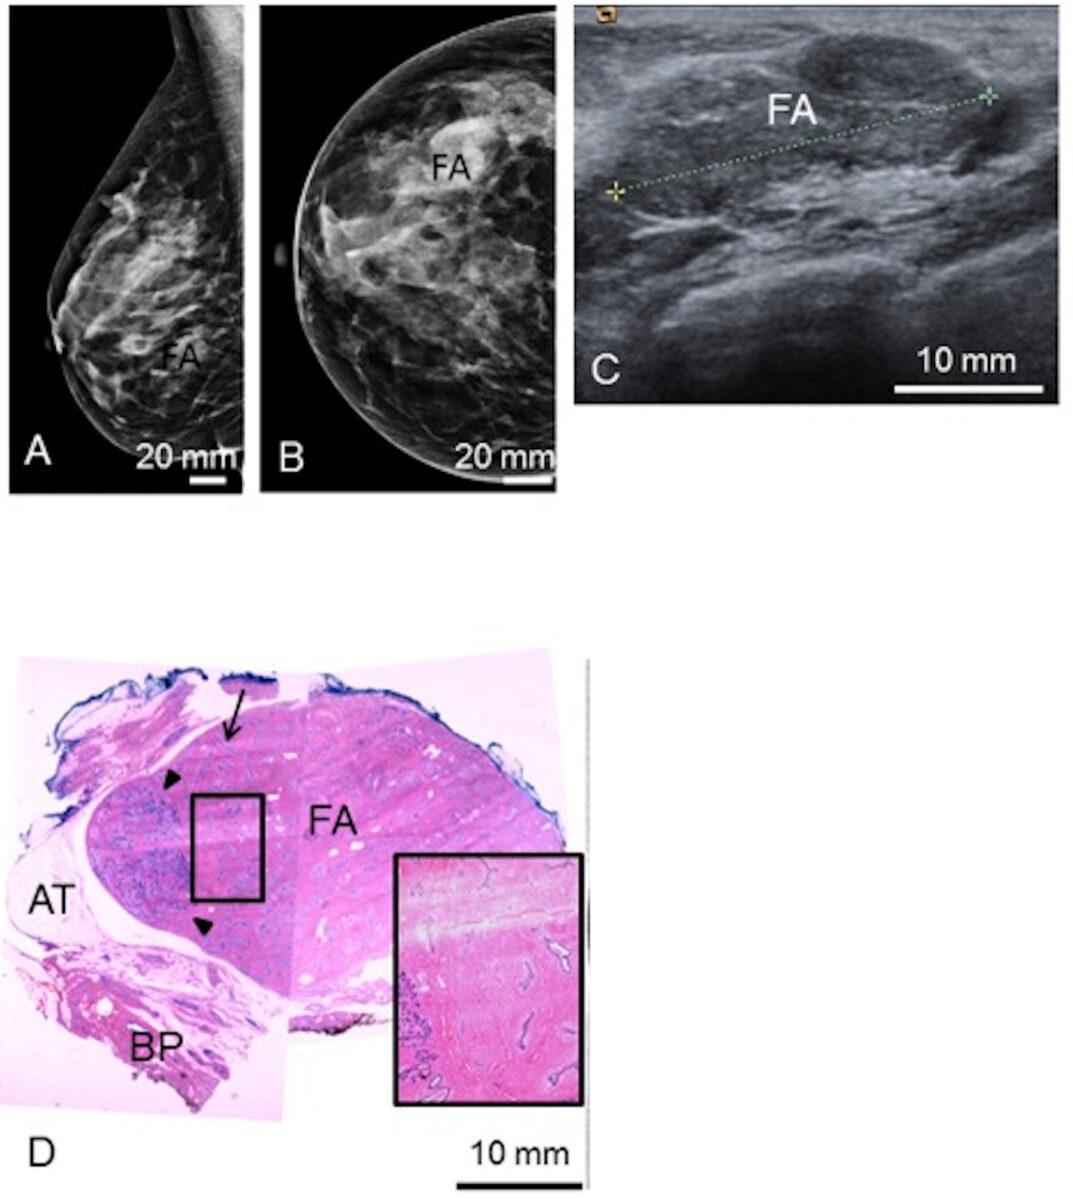 Fibroadenoma imaging